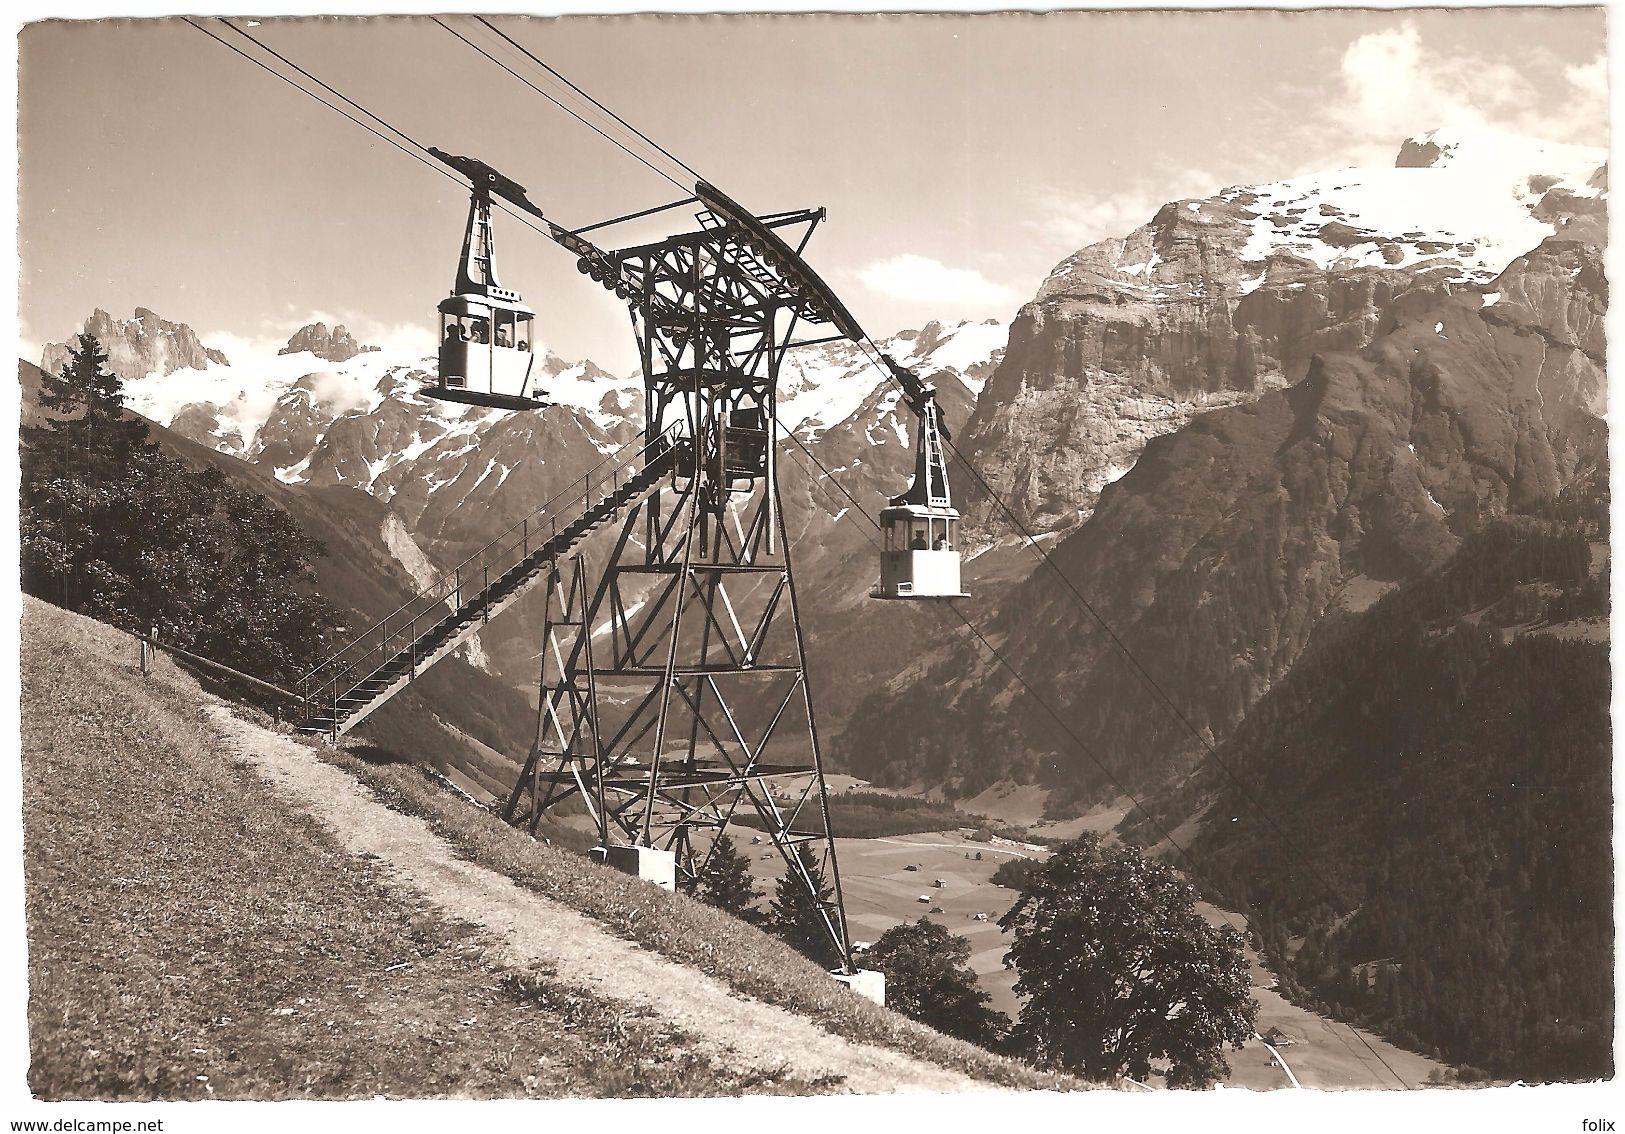 Luftseilbahn Engelberg-Brunni - 1963 - OW Obwald